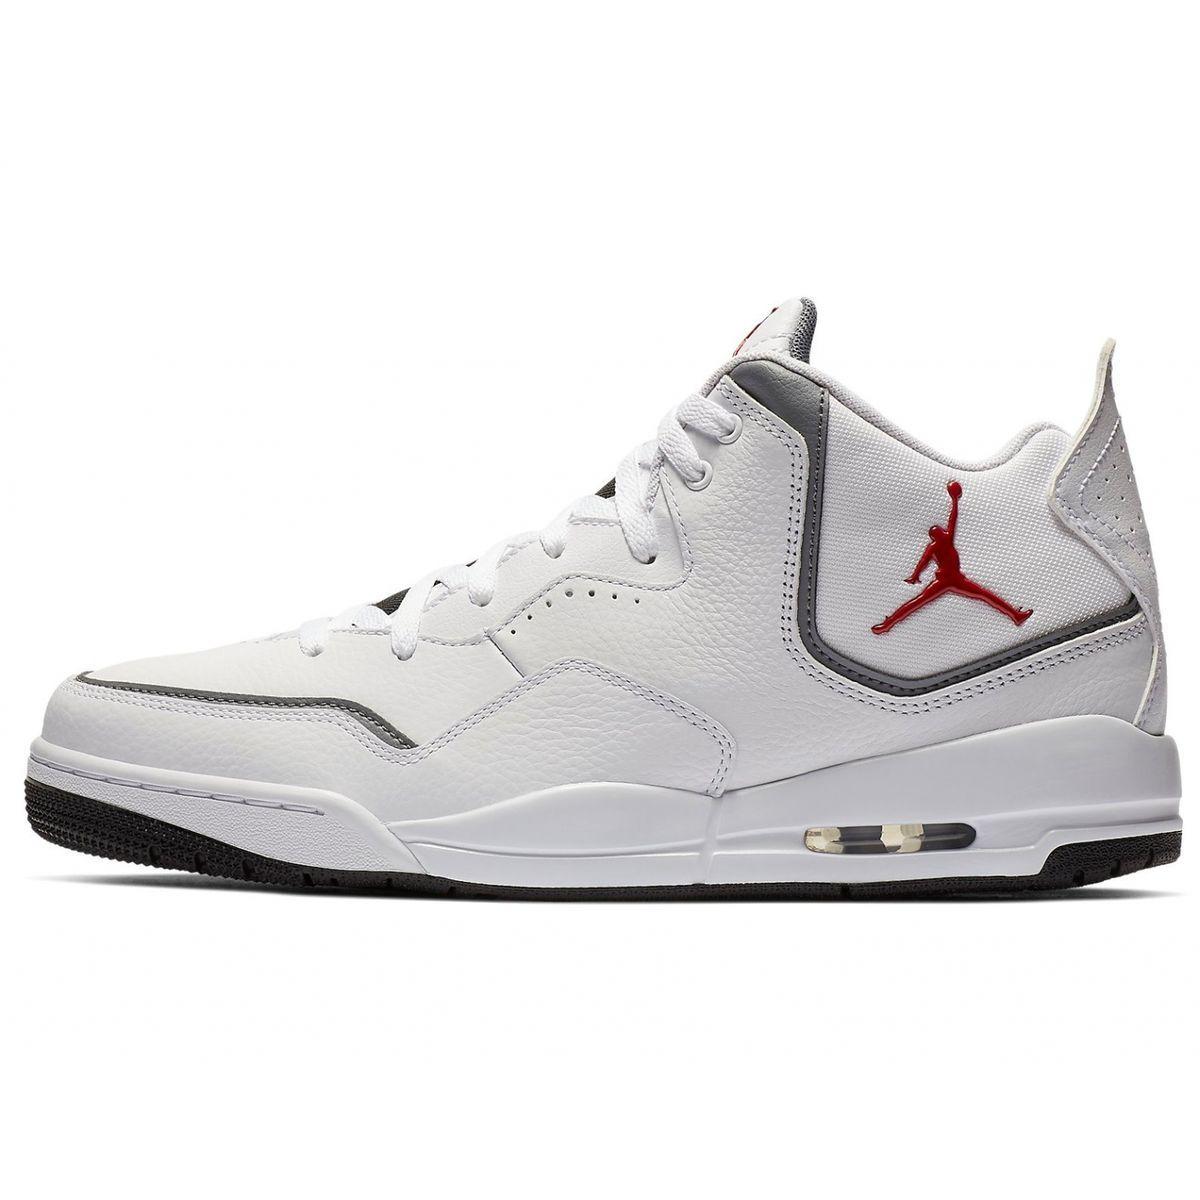 jordan nike Pas courtside Chaussures air cher 6yY7fgbv